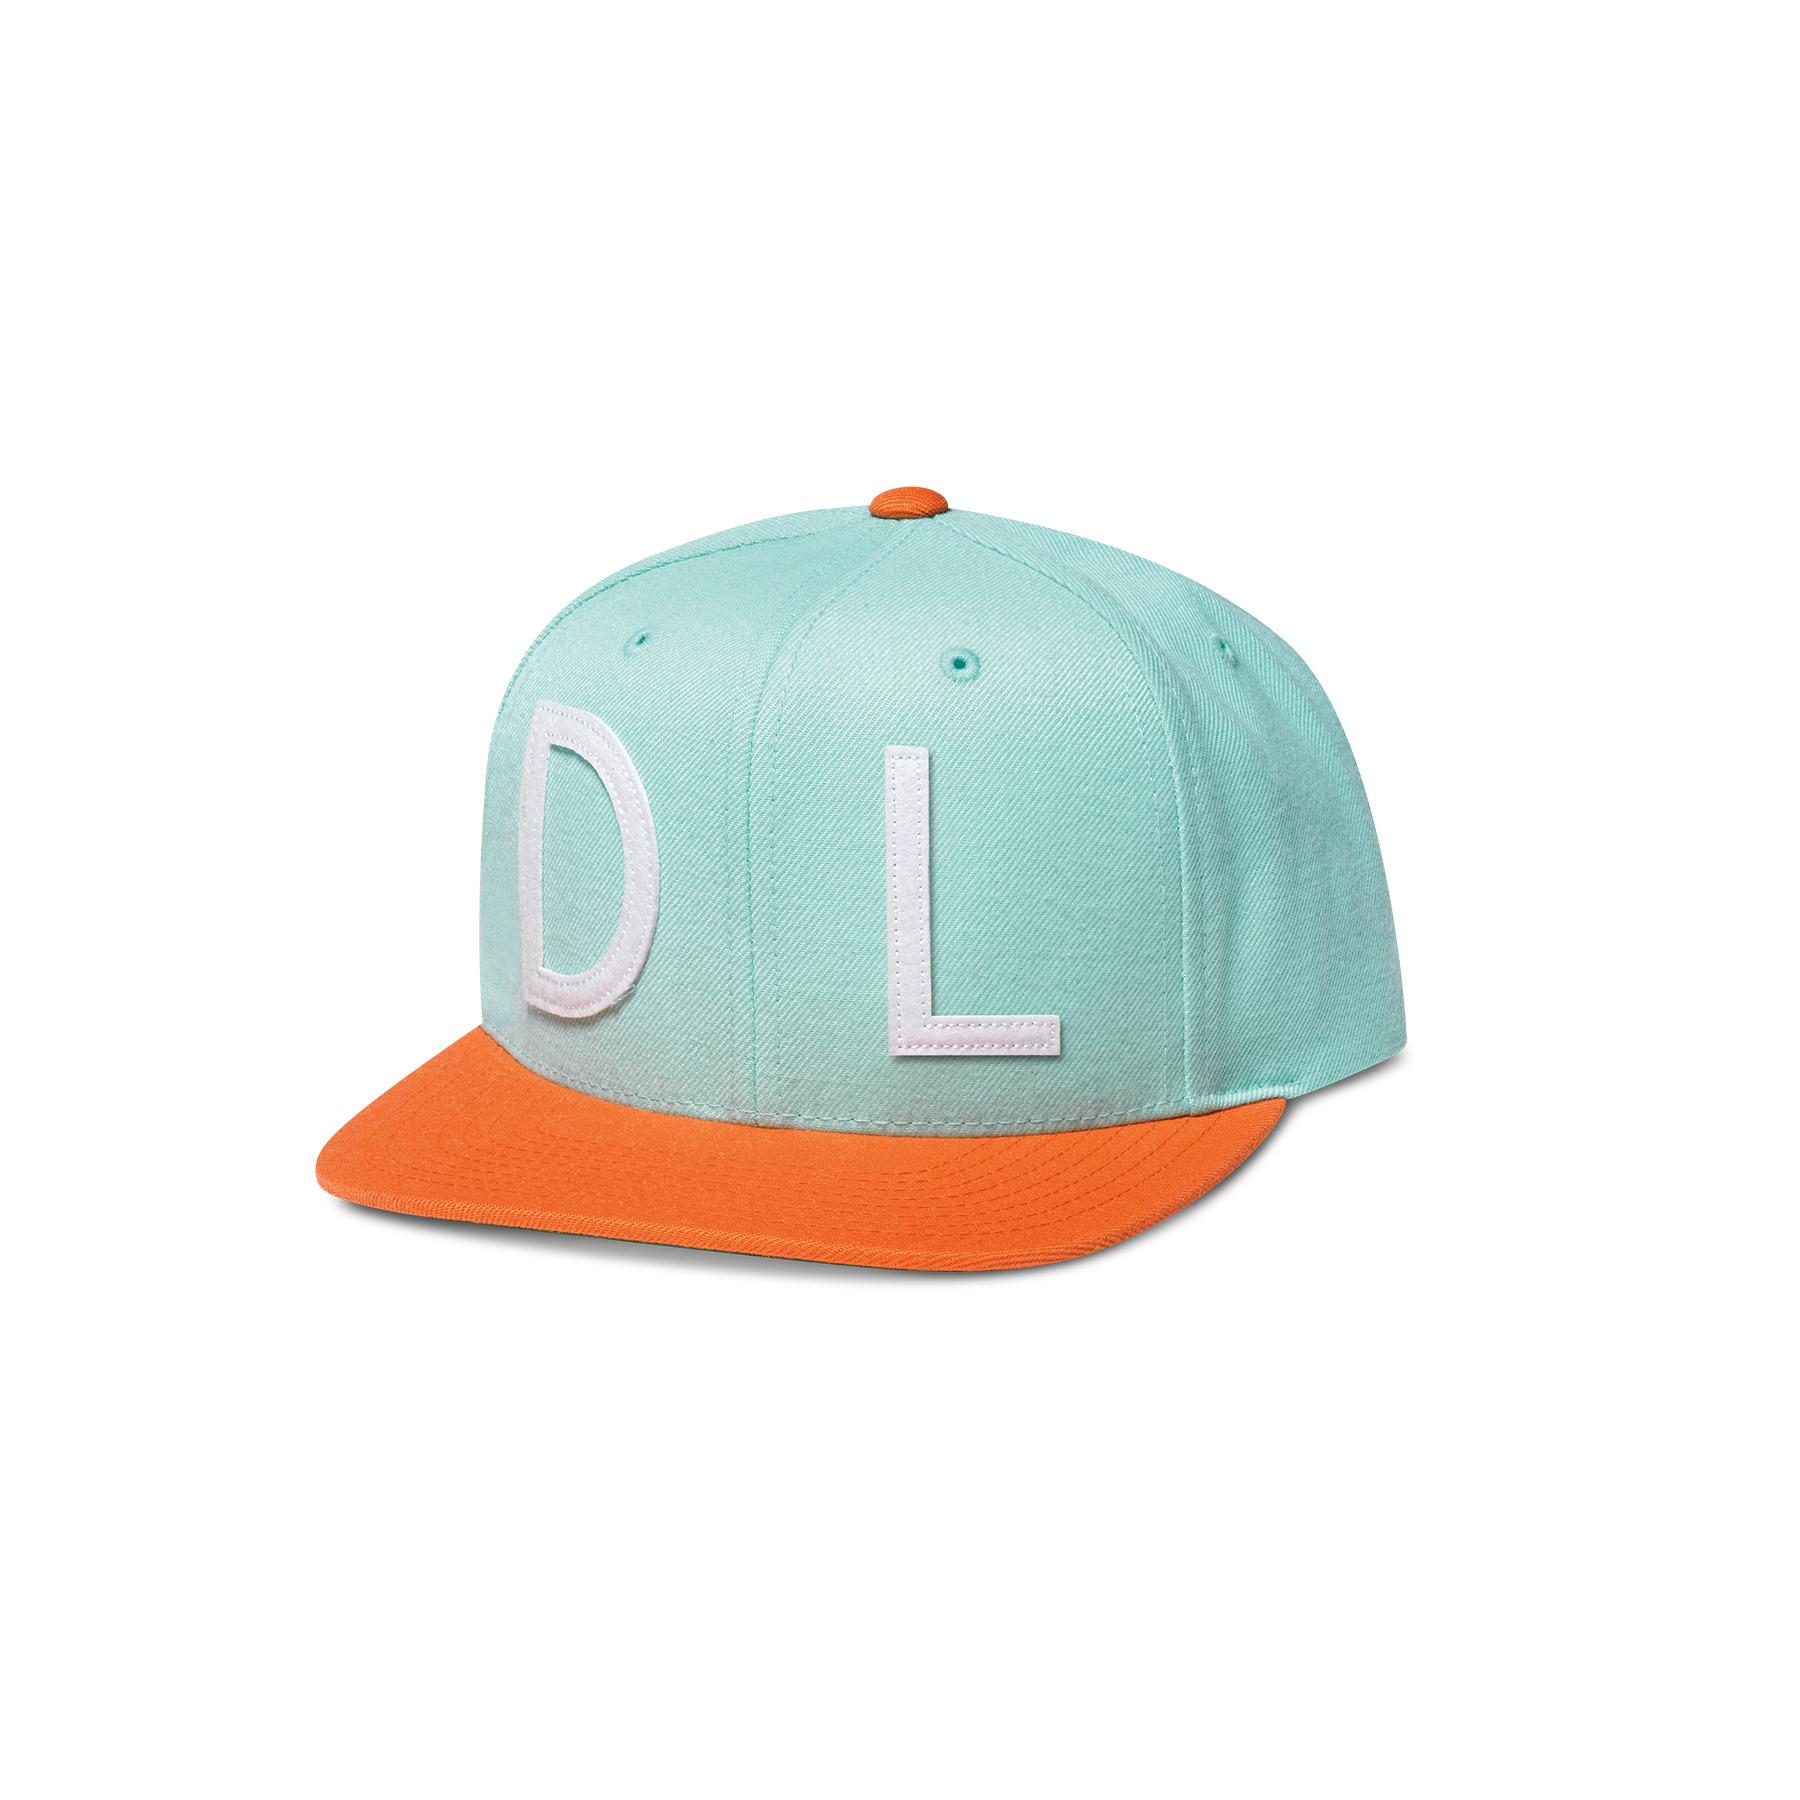 sp_15_hats__0020_dmnd-sp15-hats-dlsnapback-diblue.jpg